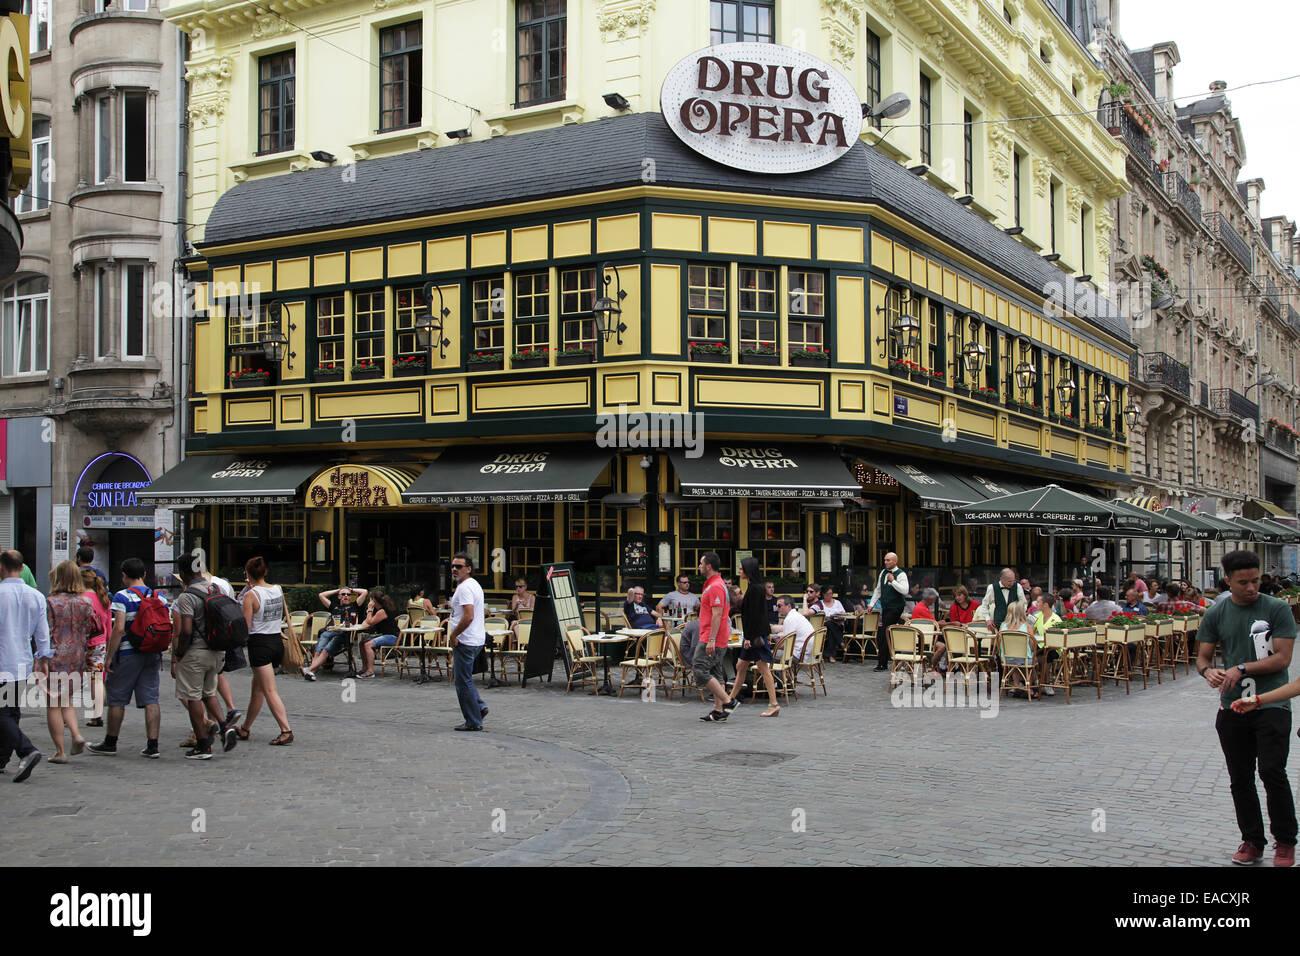 Restaurant Brussels Drug Opera.Brussels Belgium - Stock Image